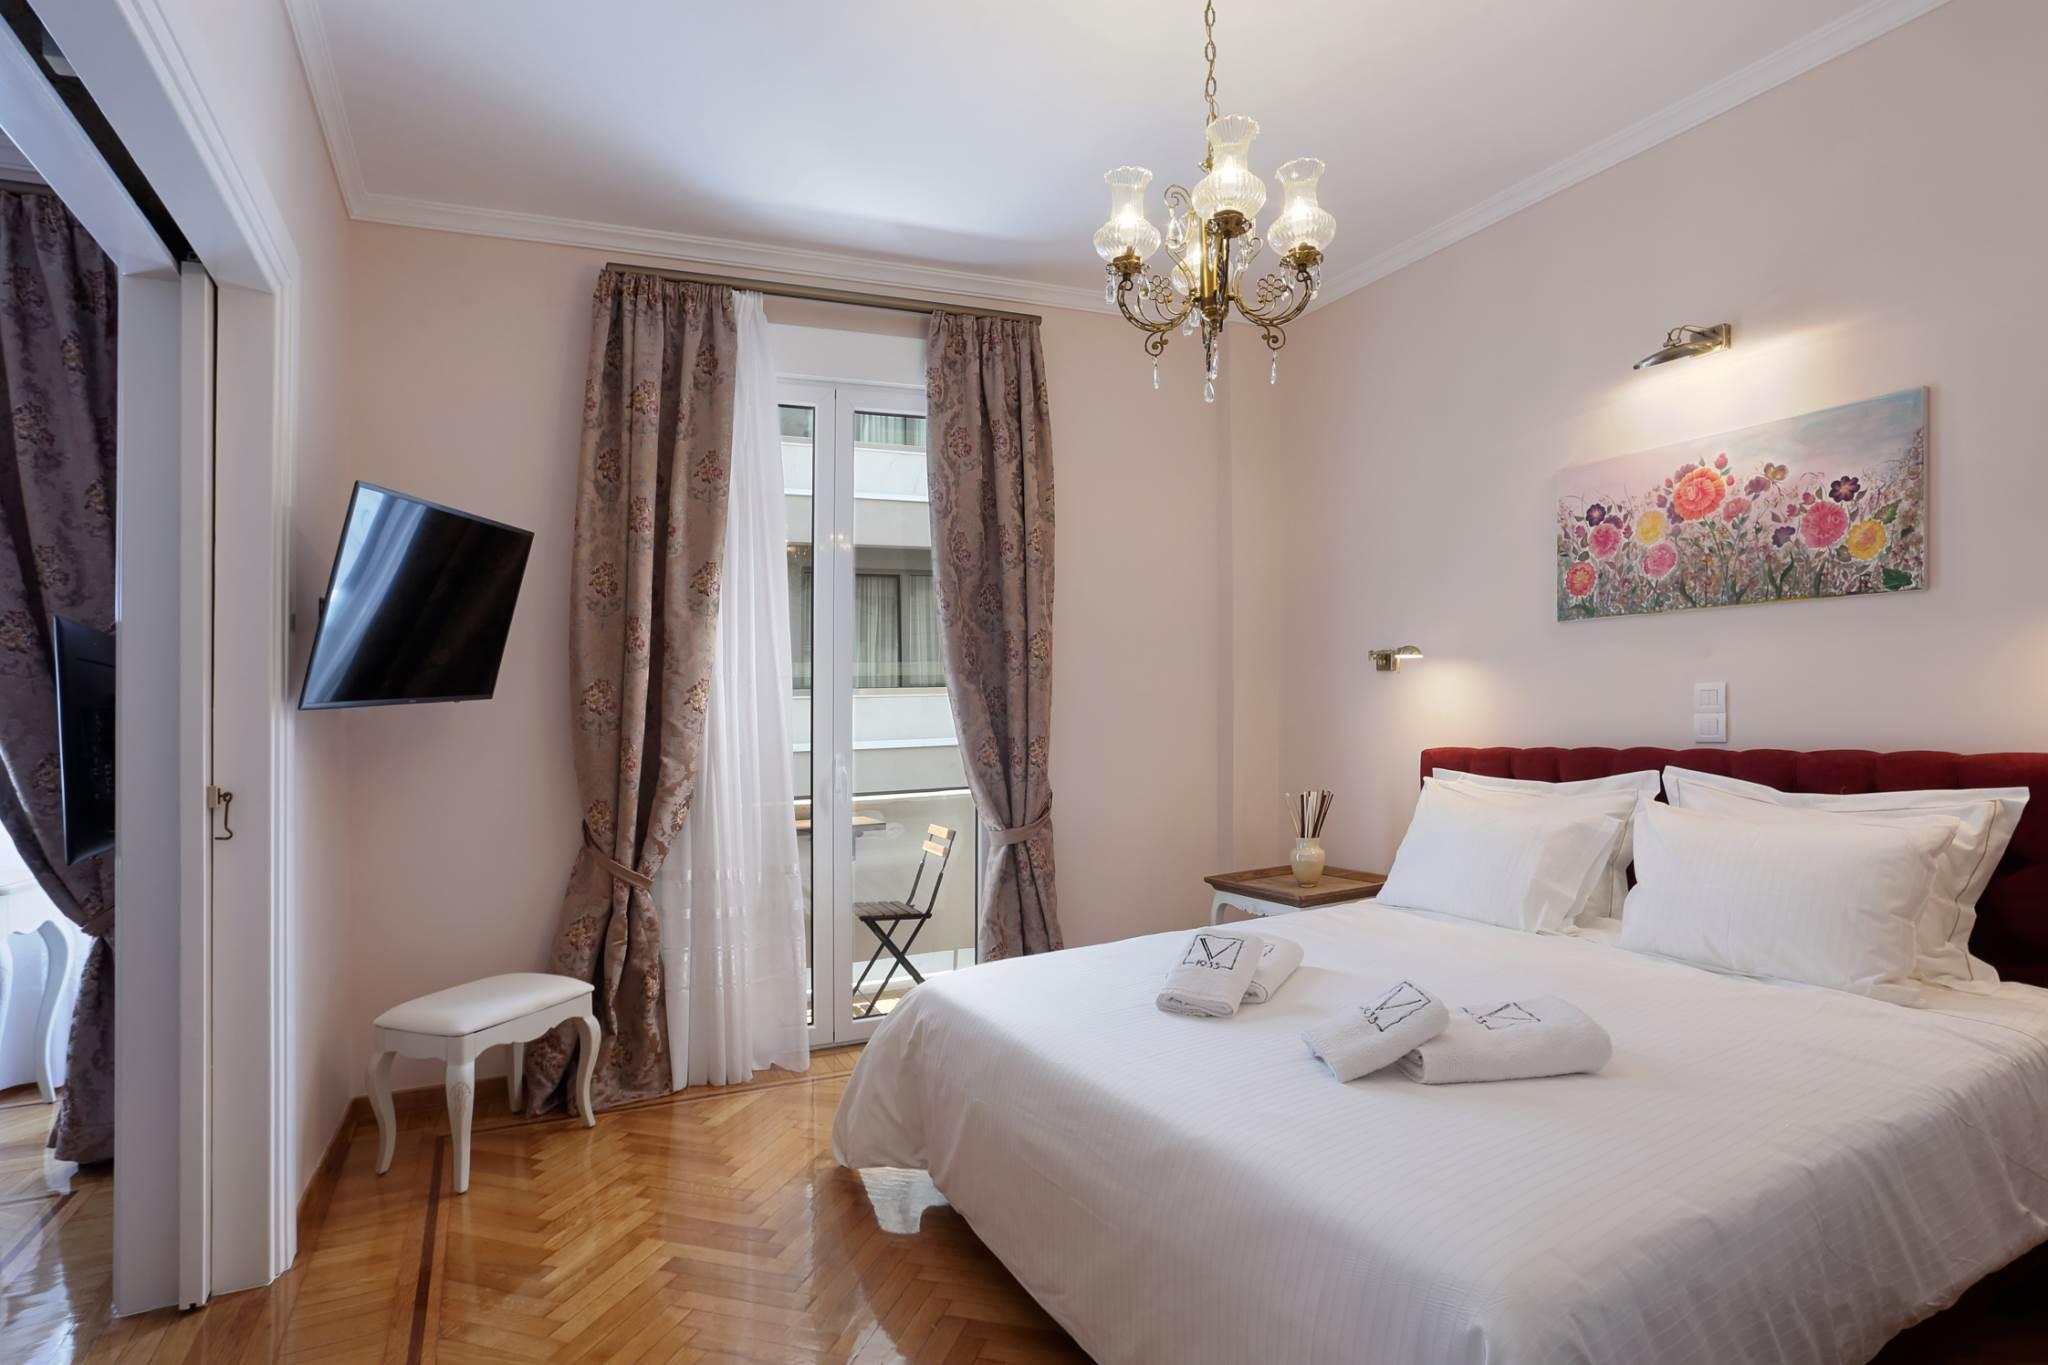 V1935 B1 Fully Renovated one bedroom apt 1min to Syntagm...